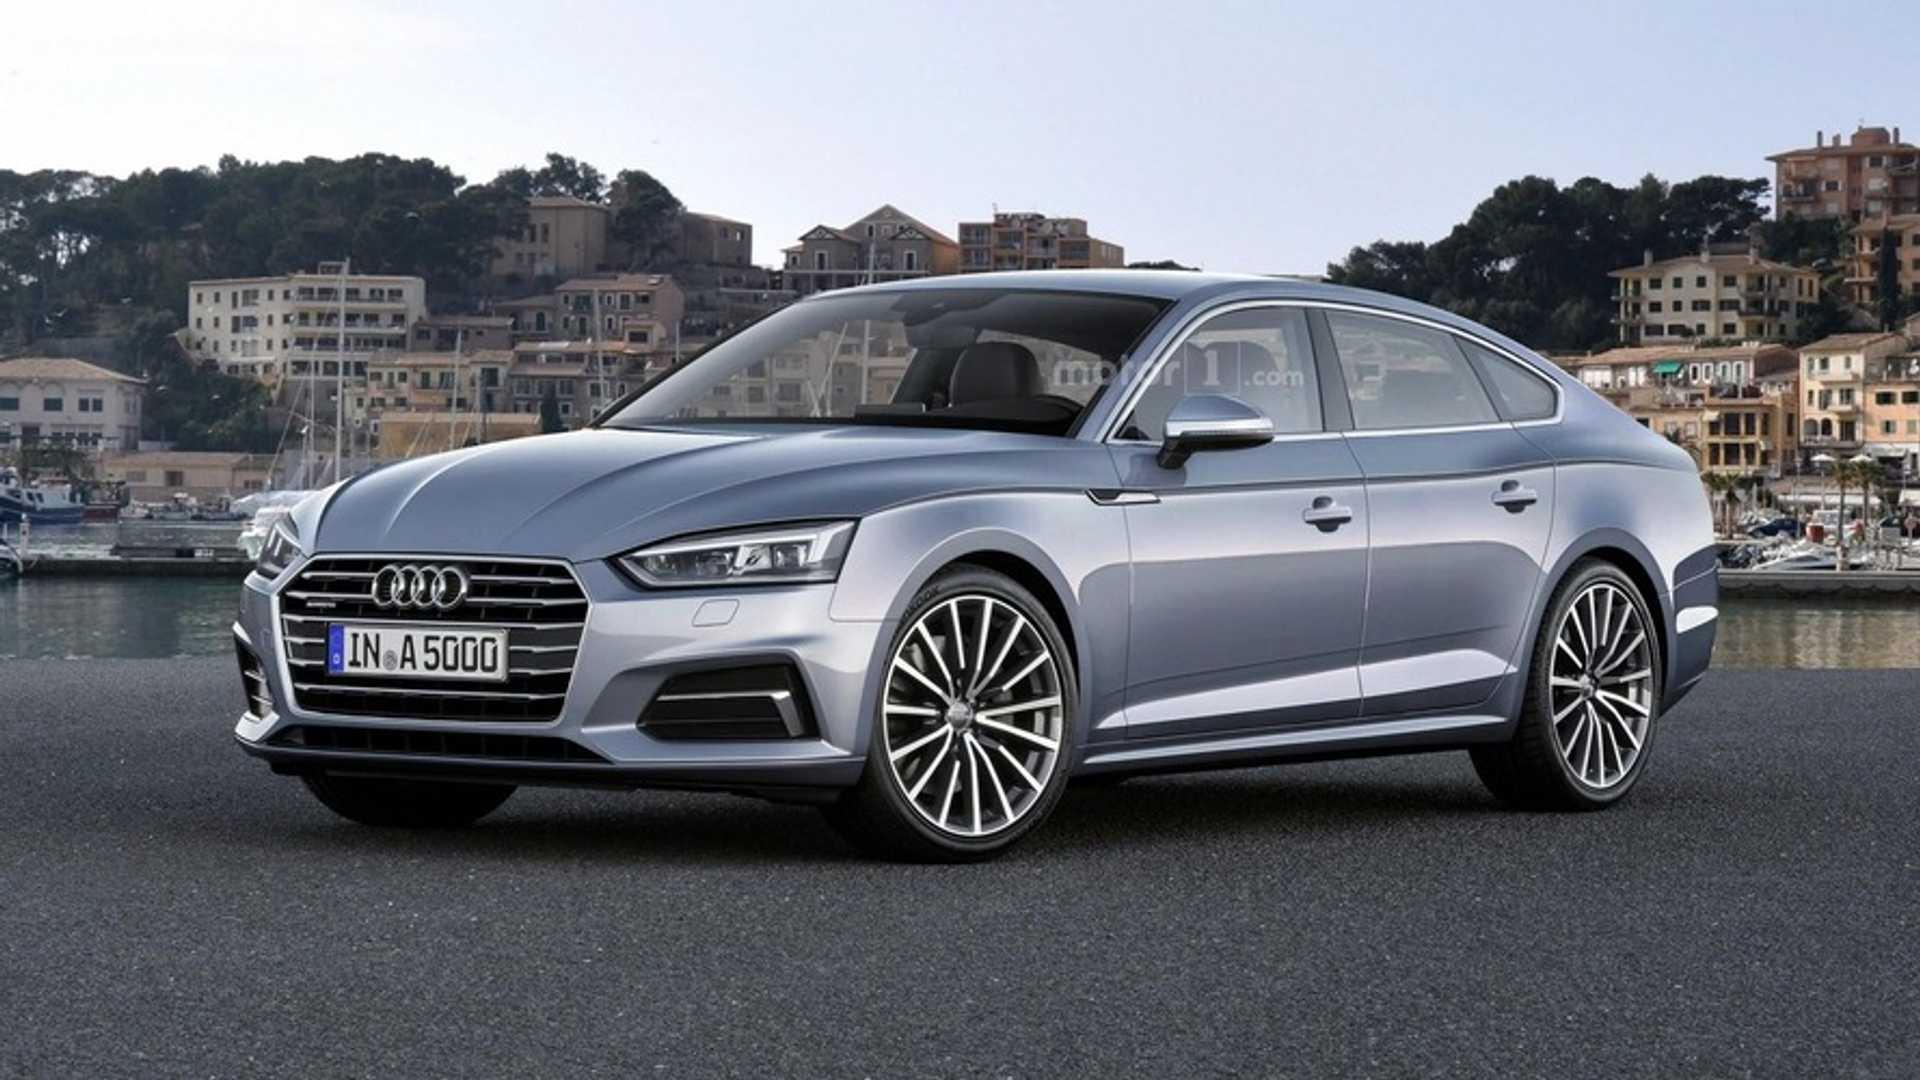 Audi A Sportback Render Previews Plausible Future - 2018 audi a5